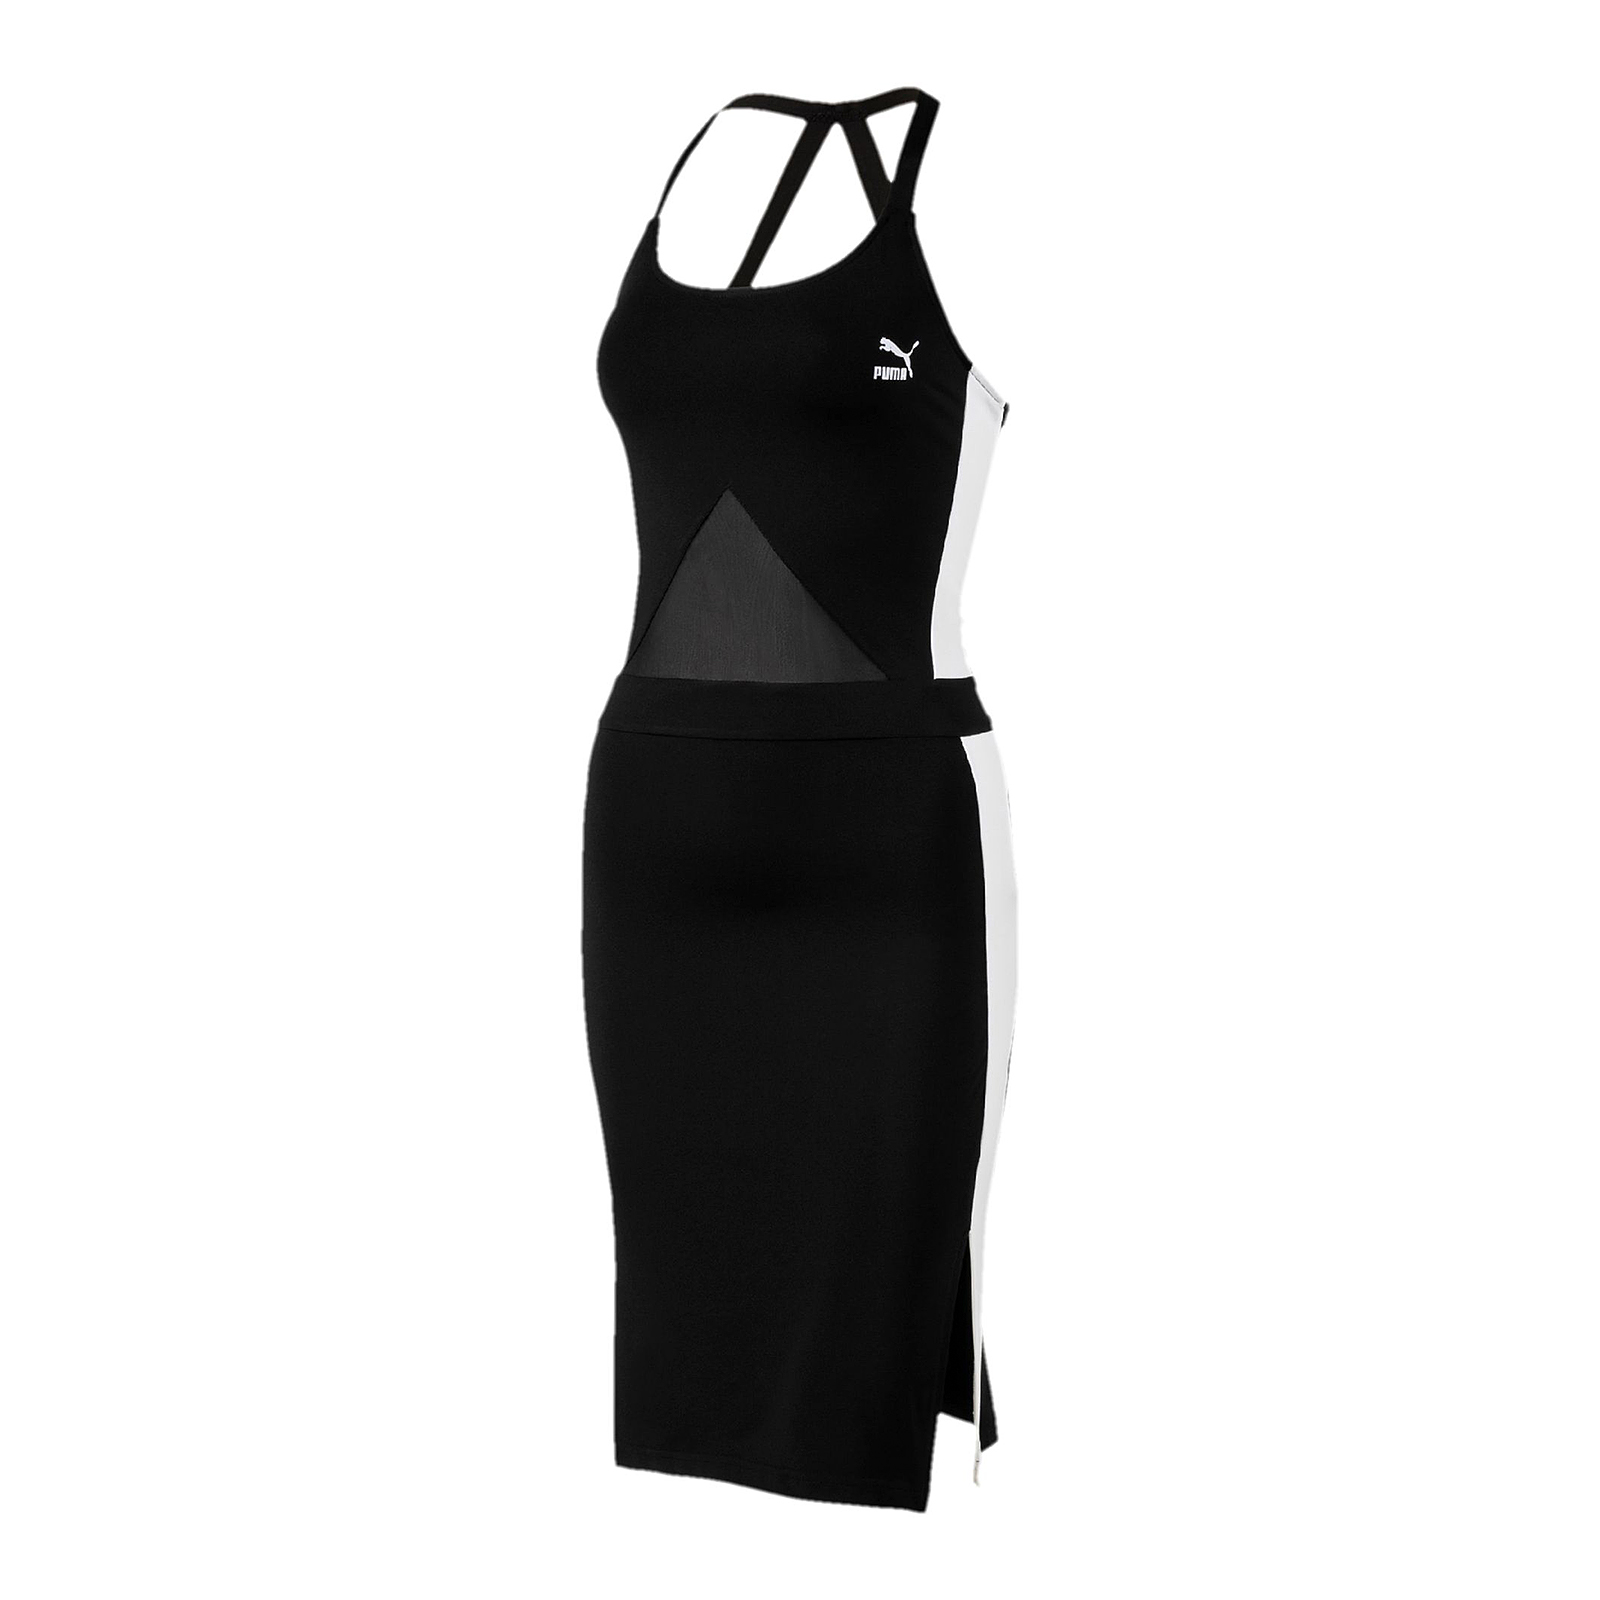 Puma Vestiti Archive T7 Dress Puma Black Nero